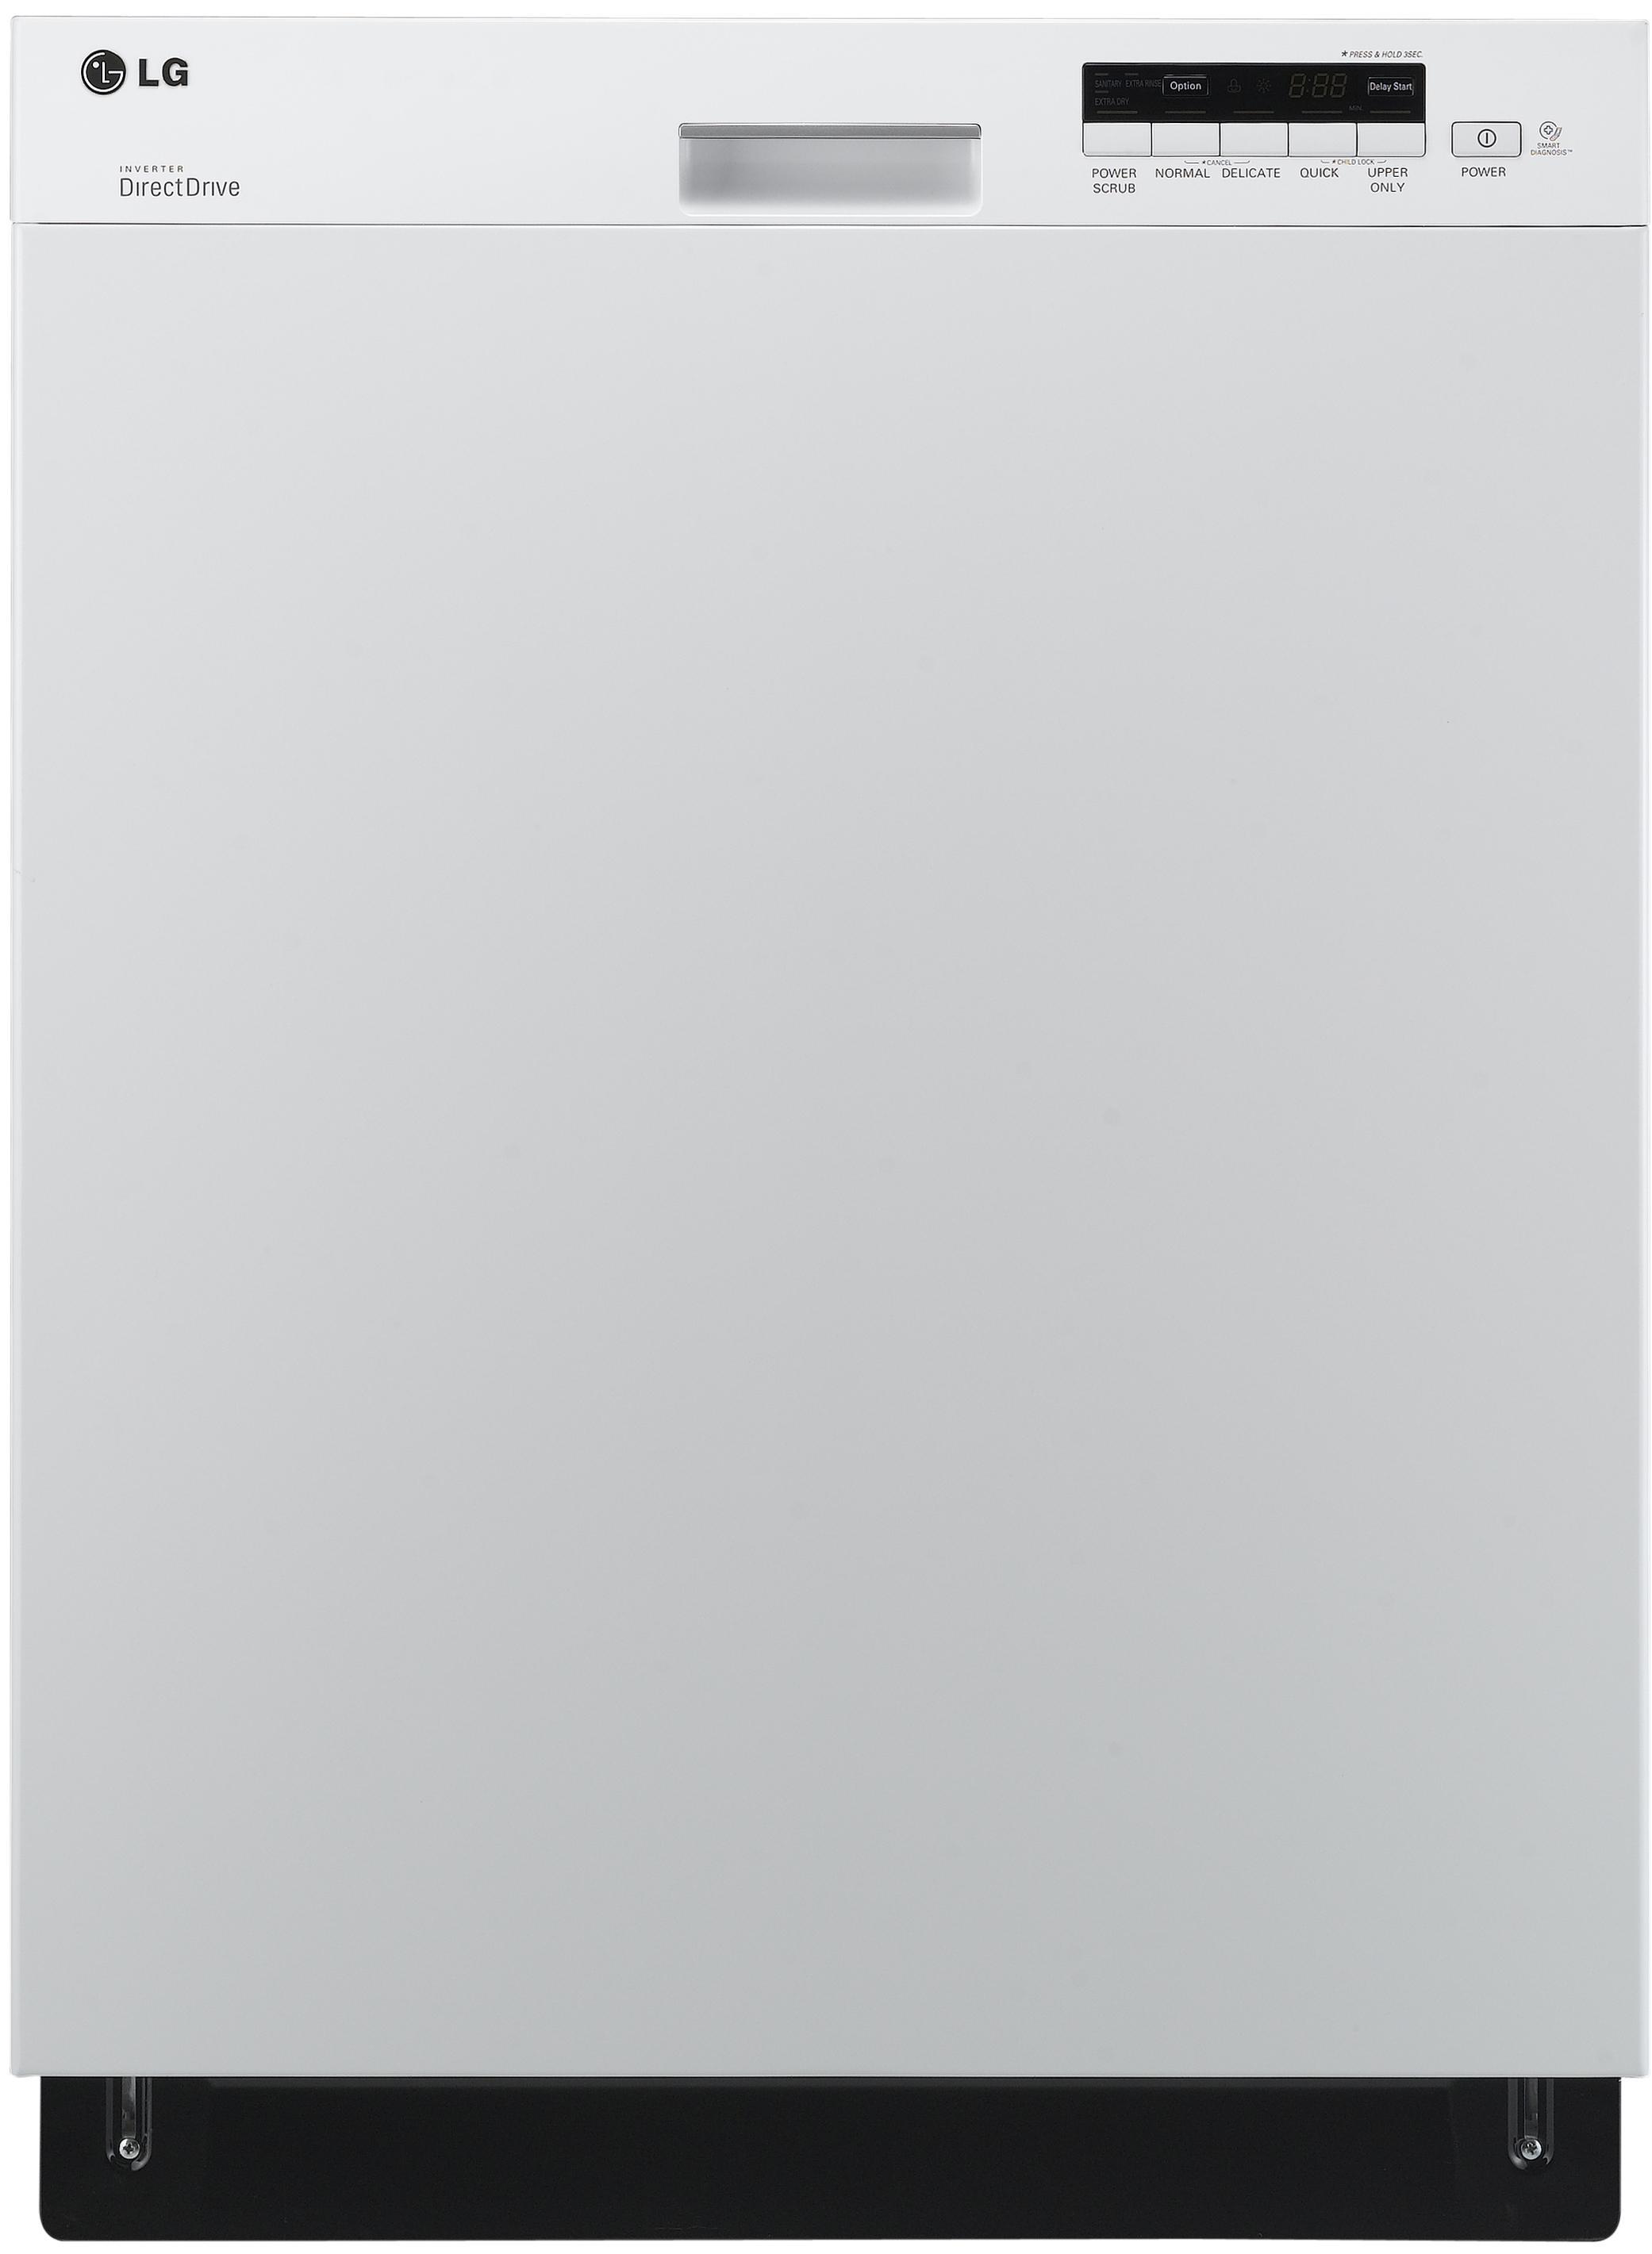 "LG Appliances Dishwashers 24"" Built-In Dishwasher - Item Number: LDS5040WW"